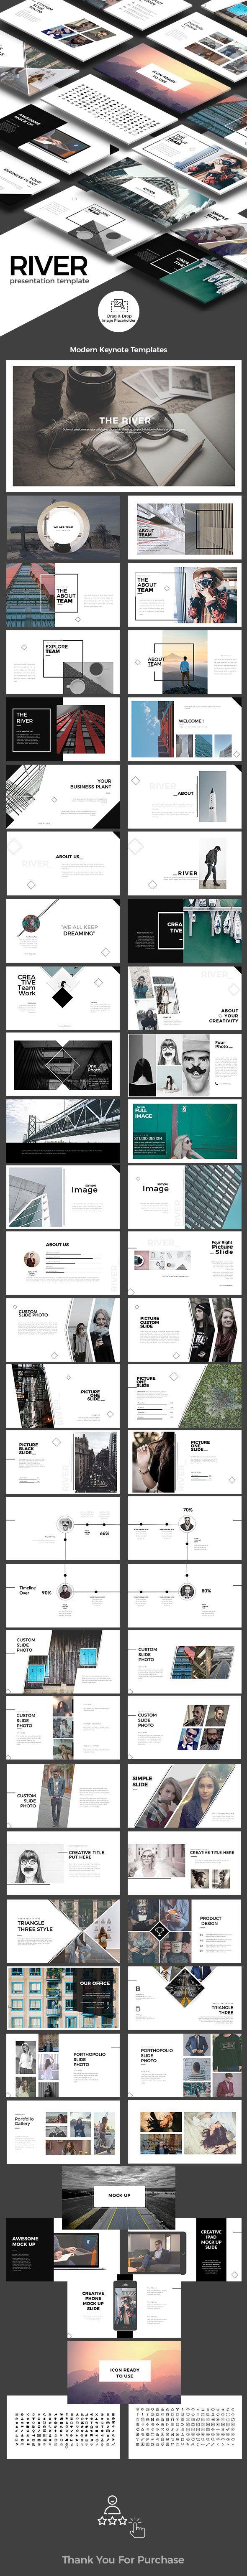 1540 best 书 images on Pinterest | Layout design, Editorial design ...